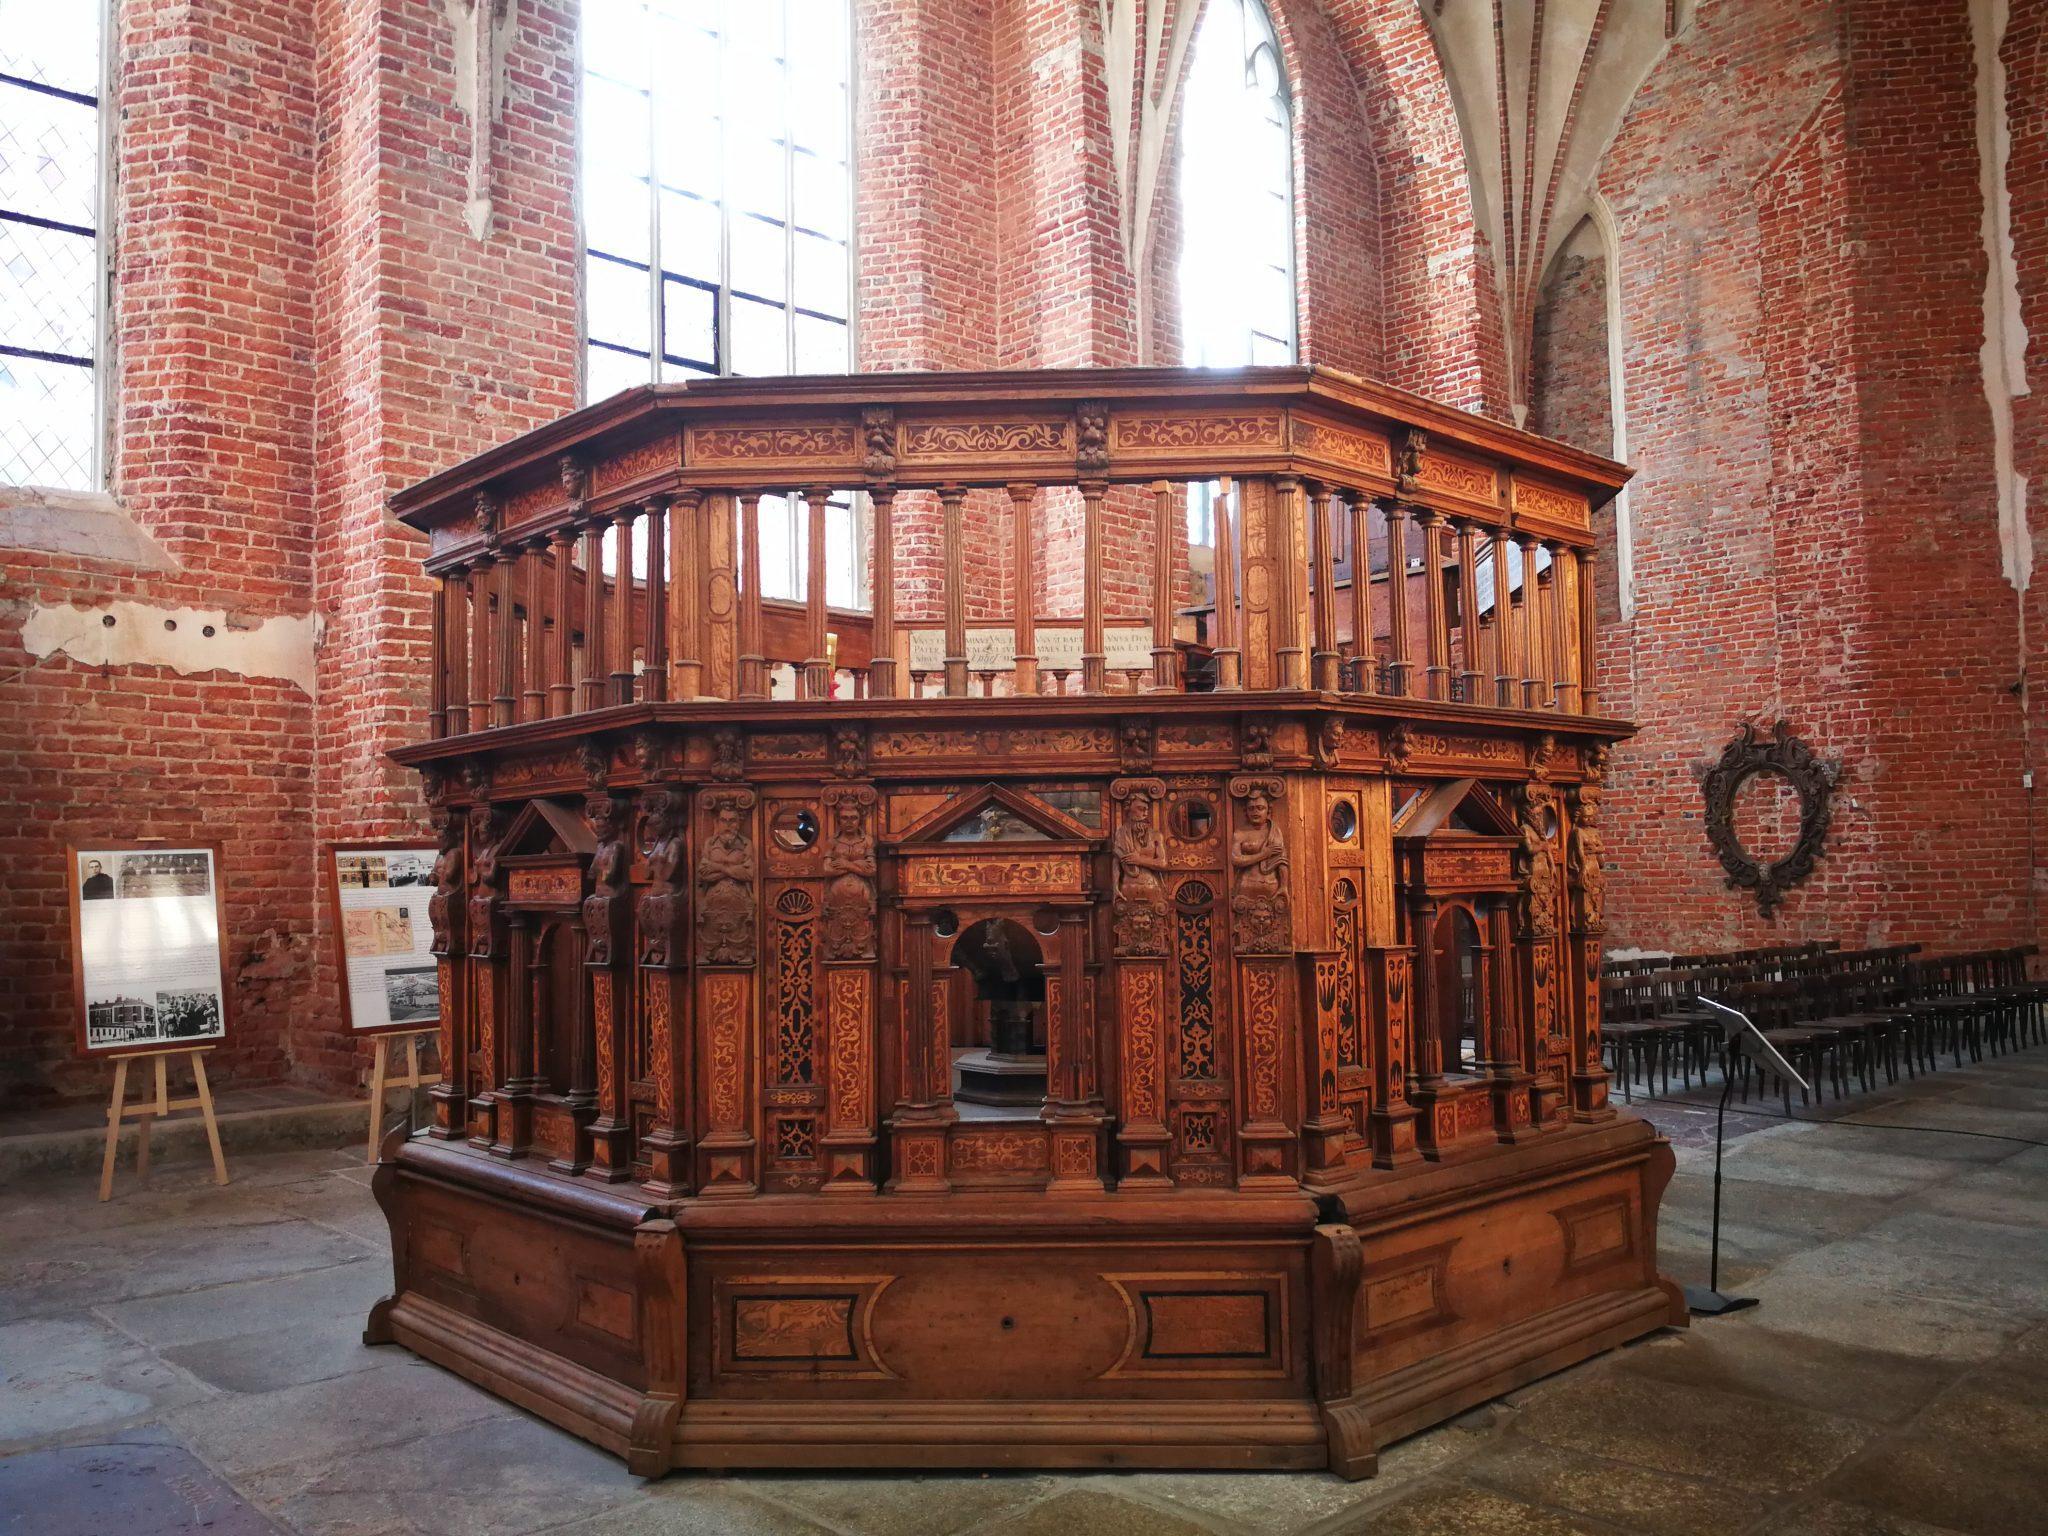 Kościół-św.-Katarzyny-babtyserium